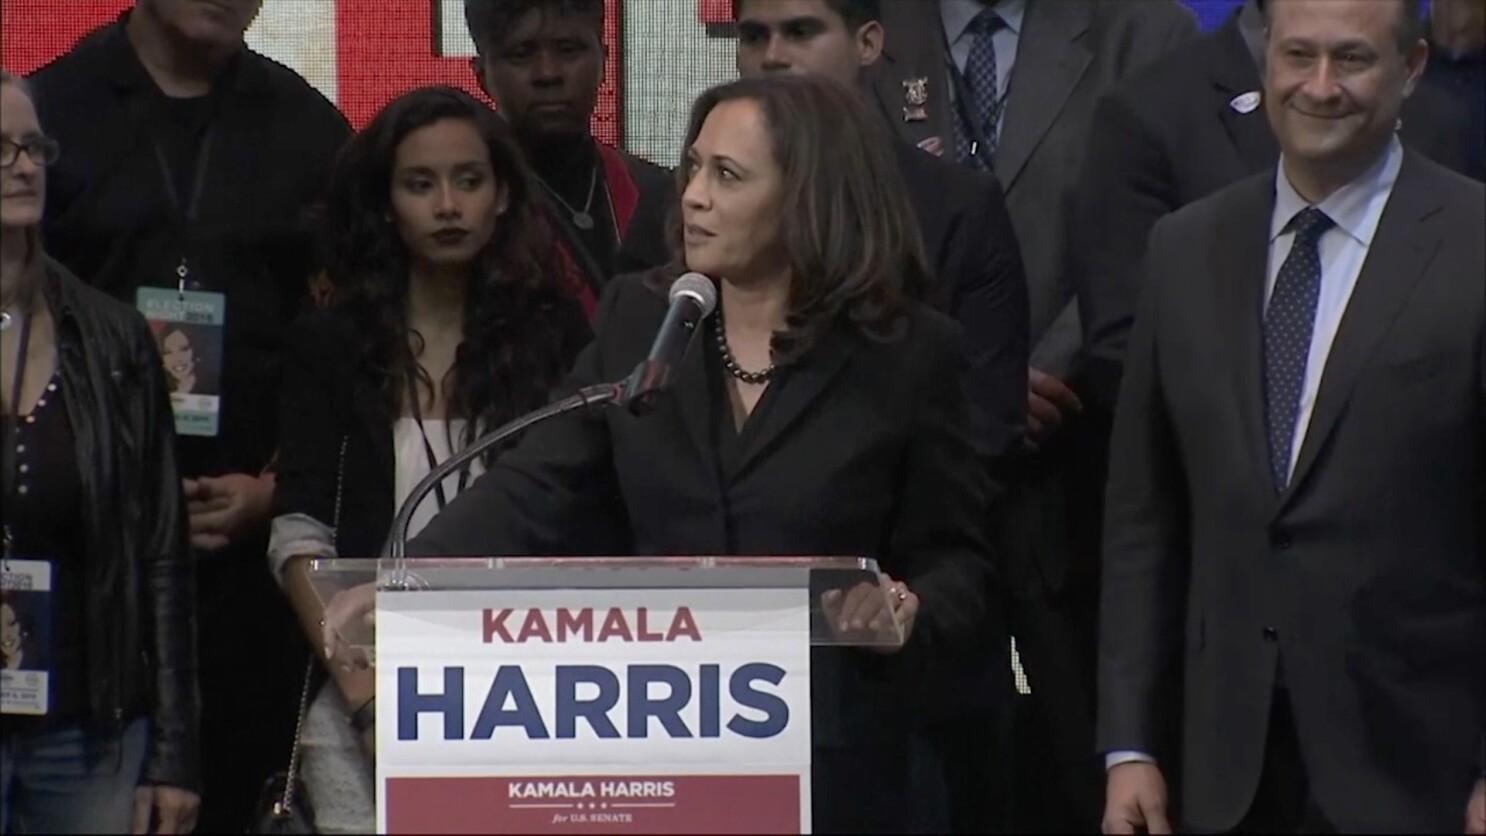 Kamala Harris Breaks A Color Barrier With Her U S Senate Win Los Angeles Times